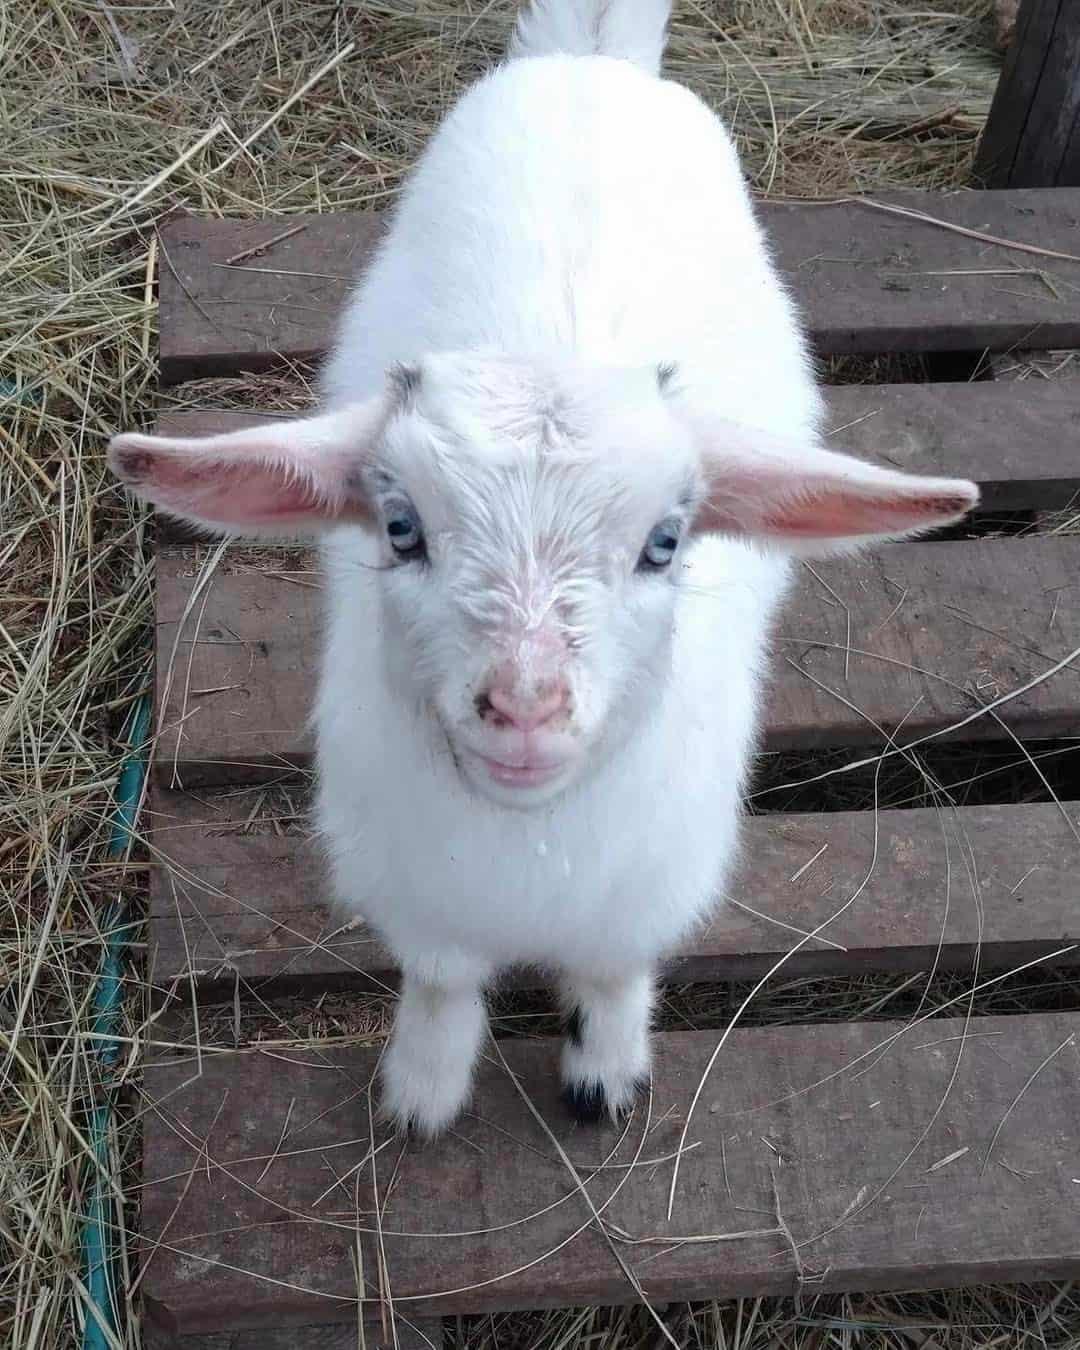 tiny baby pygmy goat standing on a pallet